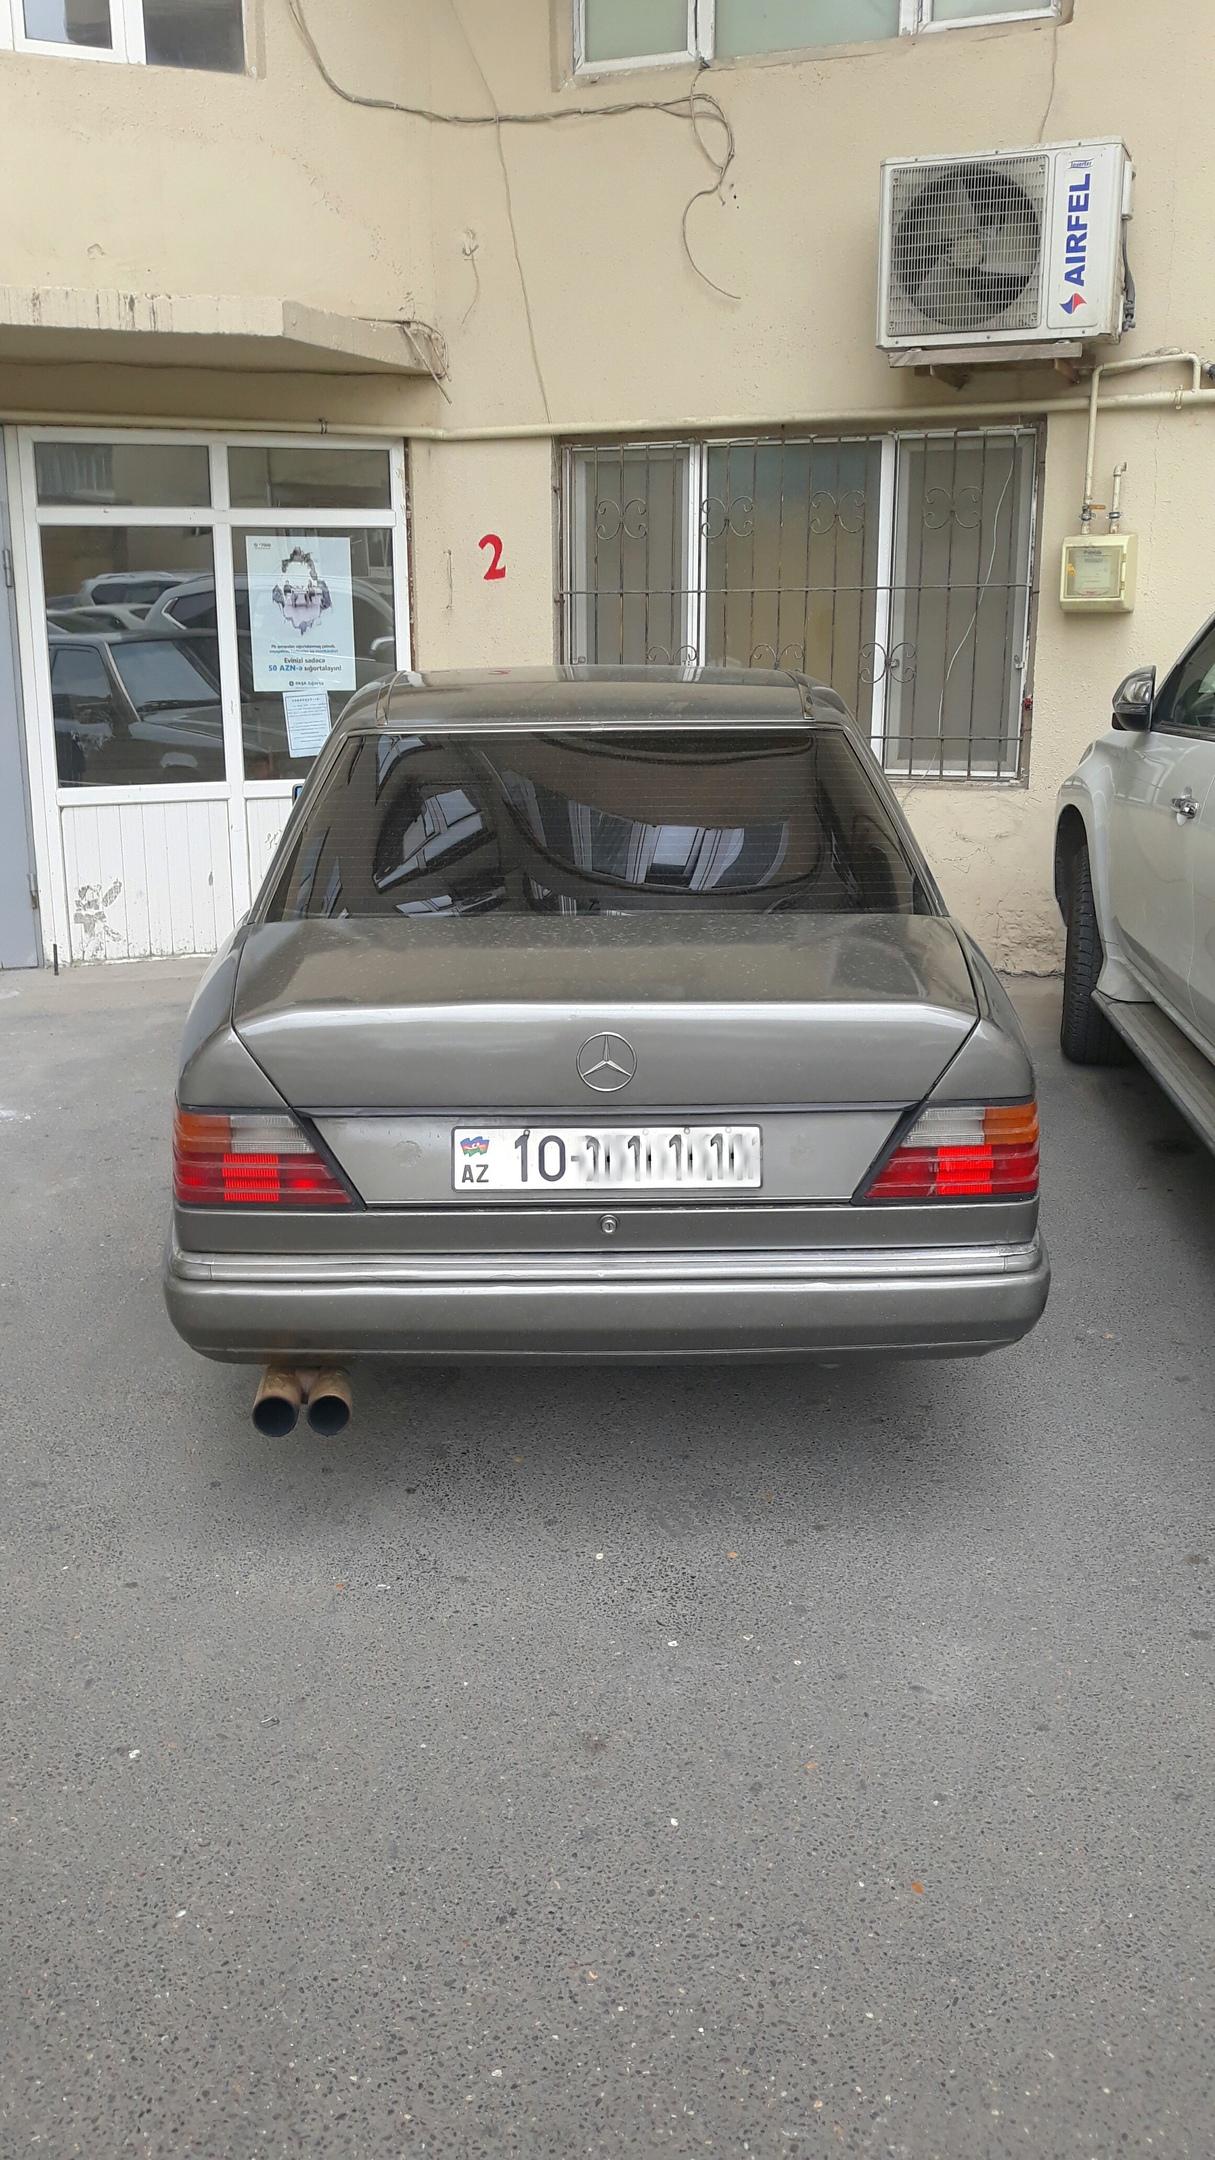 Mercedes-Benz 230 2.3(lt) 1992 İkinci əl  $5500